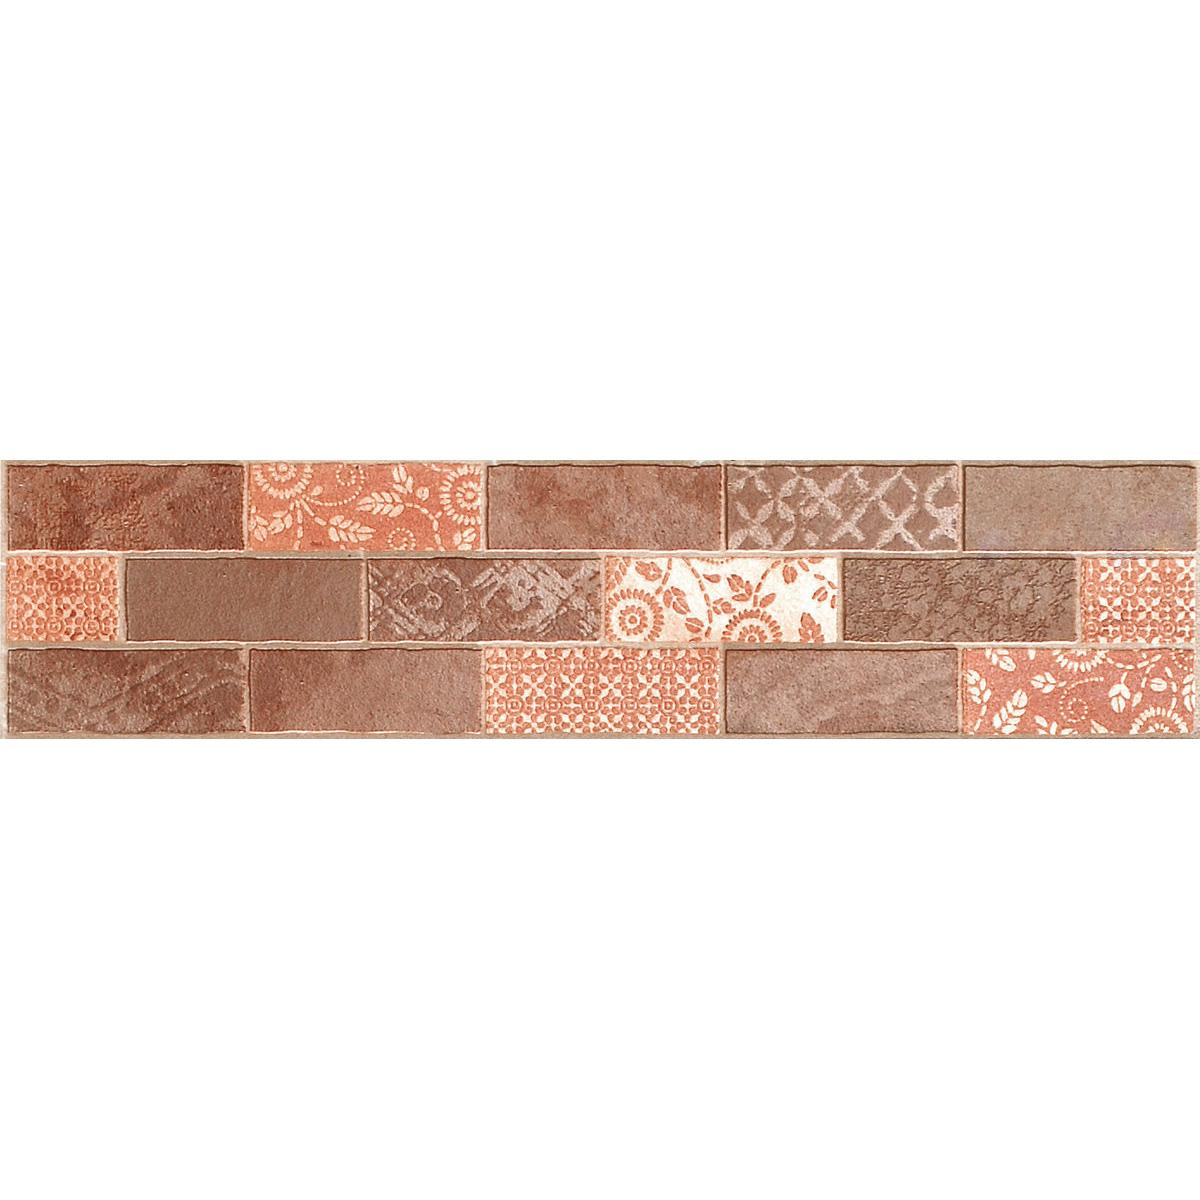 Декор Cotto Classico classico brick cotto (zmx23a1) изображение 0